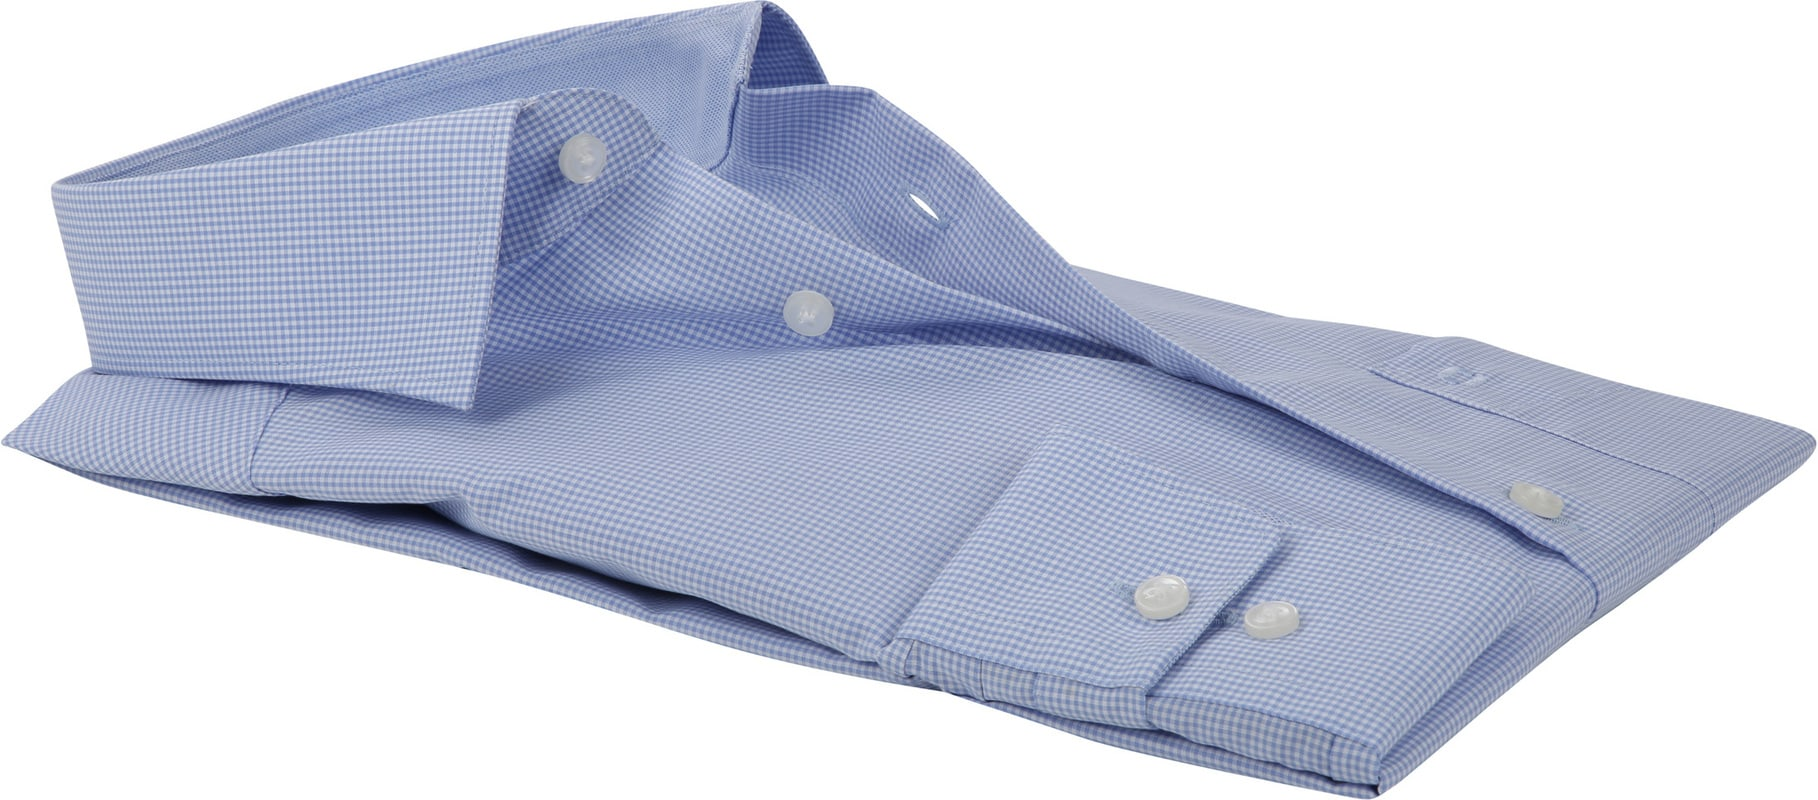 OLYMP Luxor MF Blauw Ruit Overhemd - Blauw maat 40